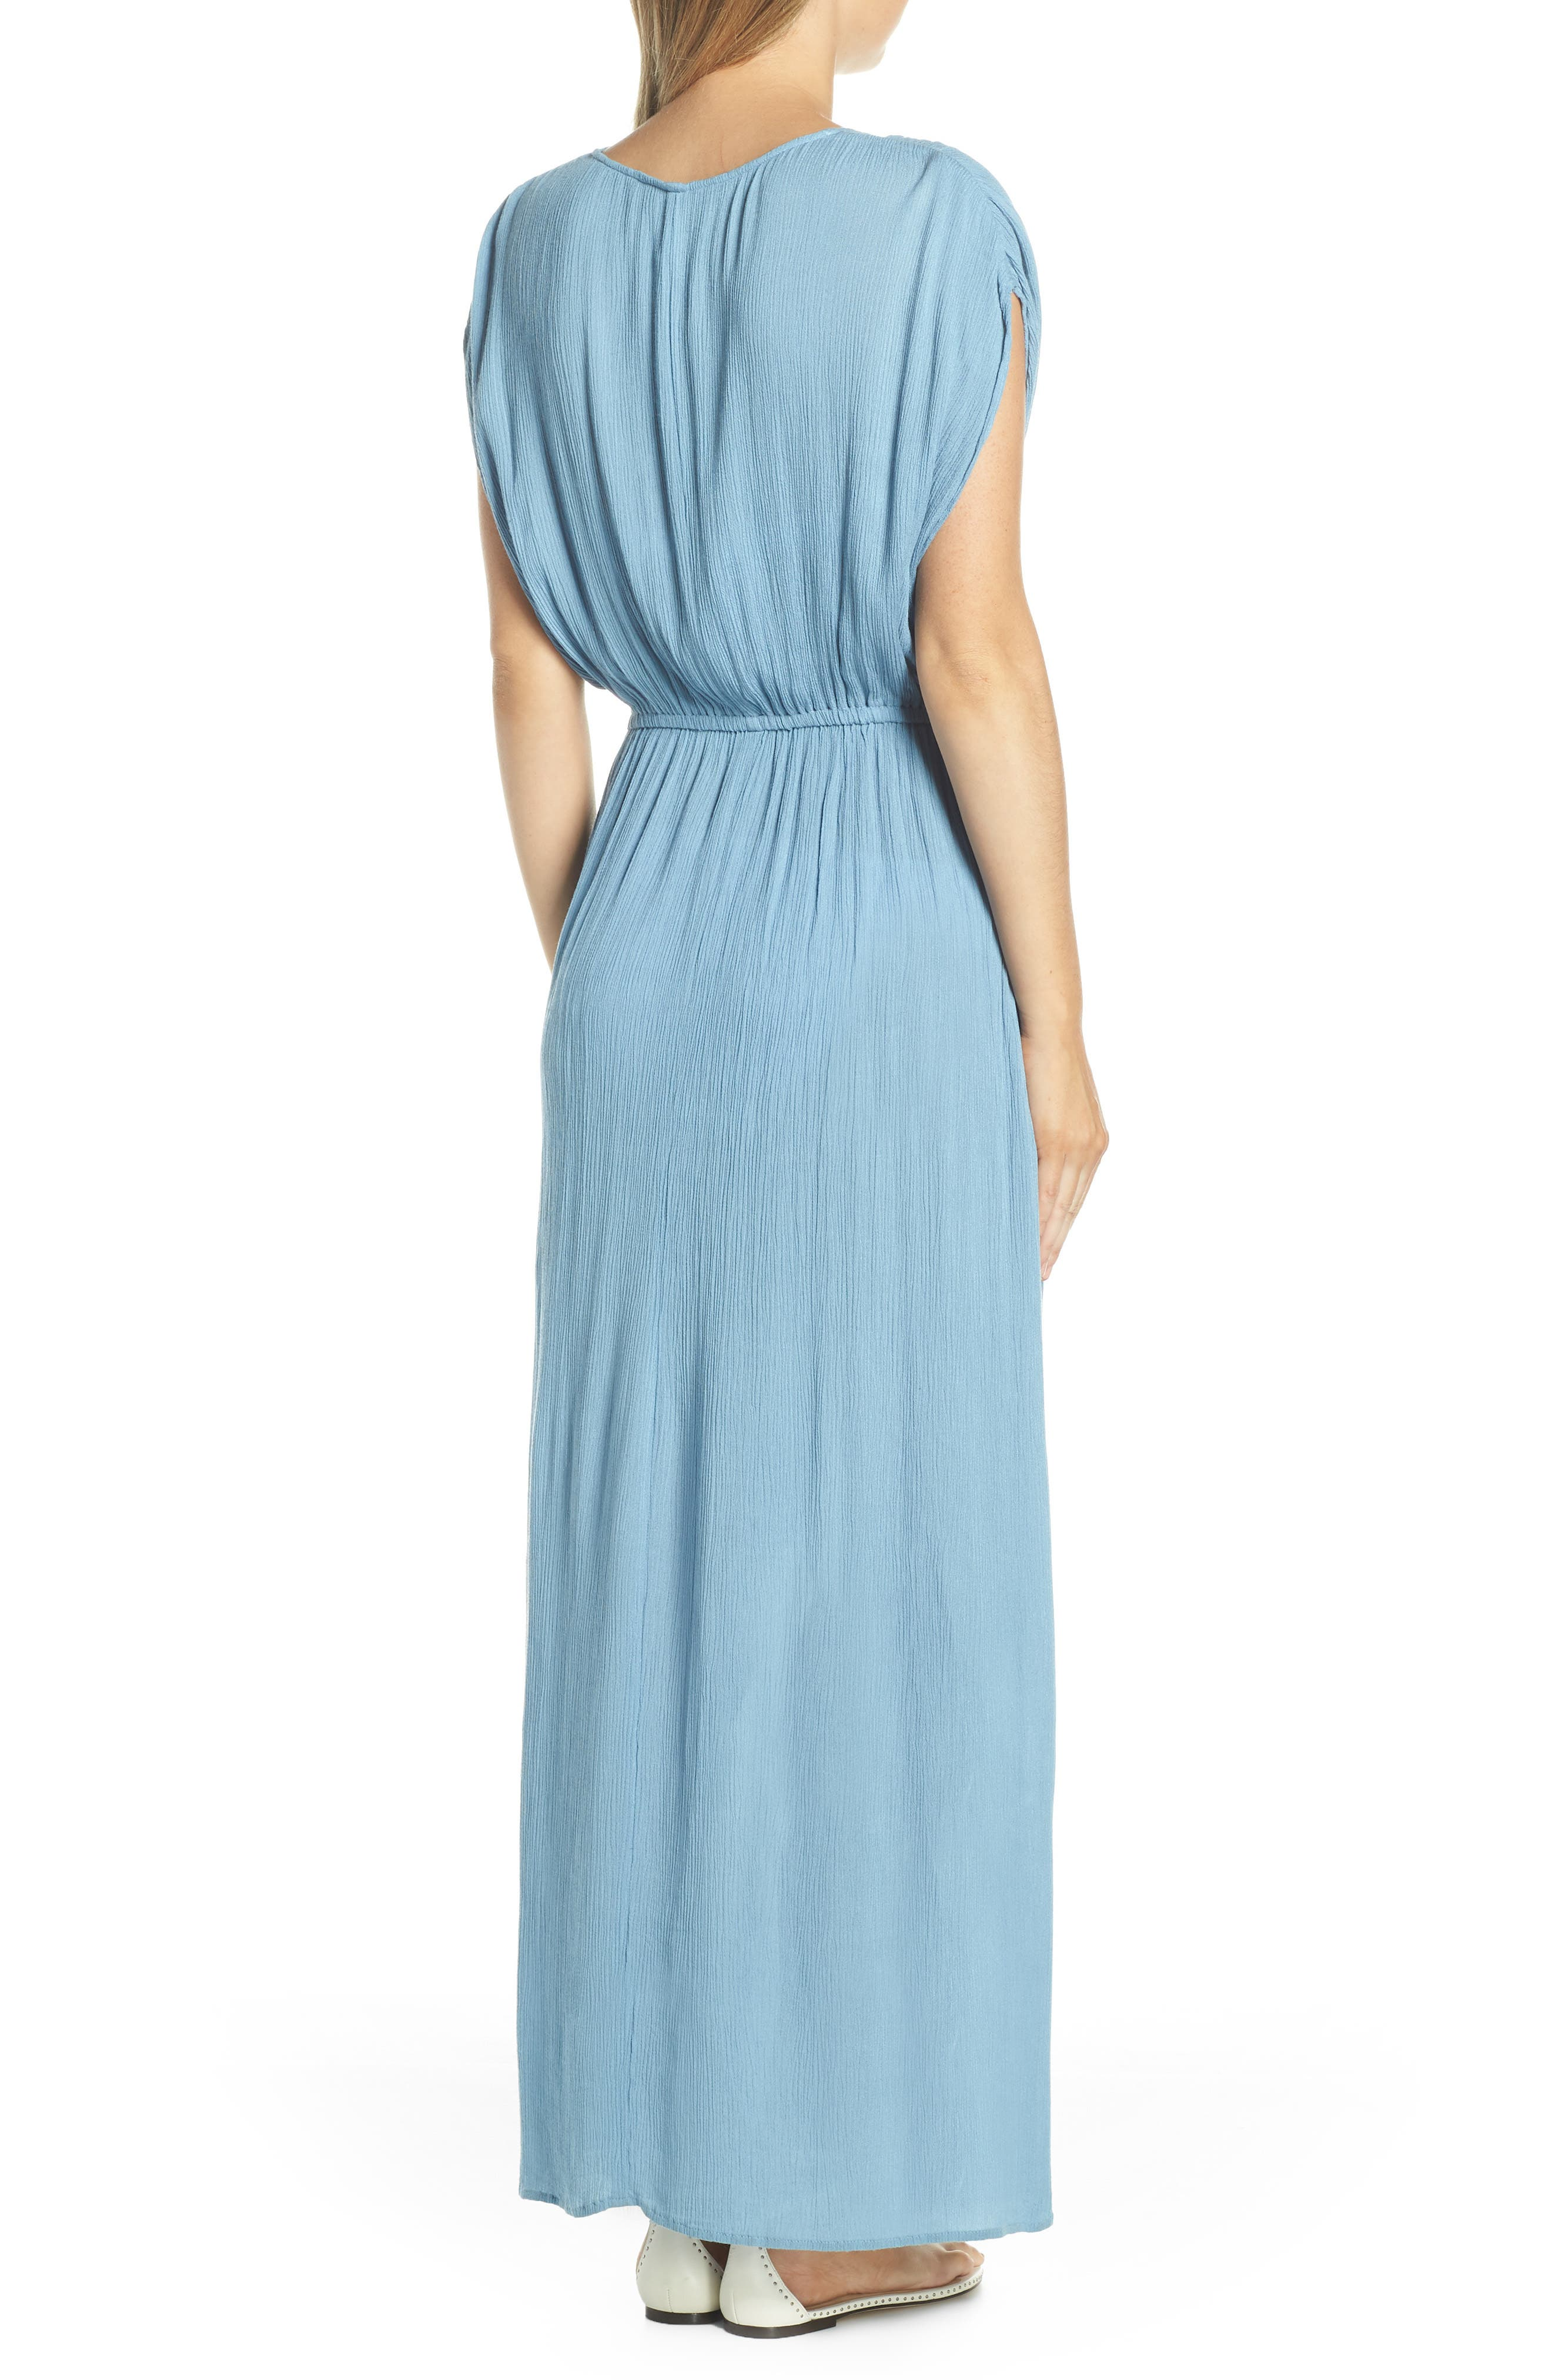 ELAN, Wrap Maxi Cover-Up Dress, Alternate thumbnail 2, color, WASHED BLUE